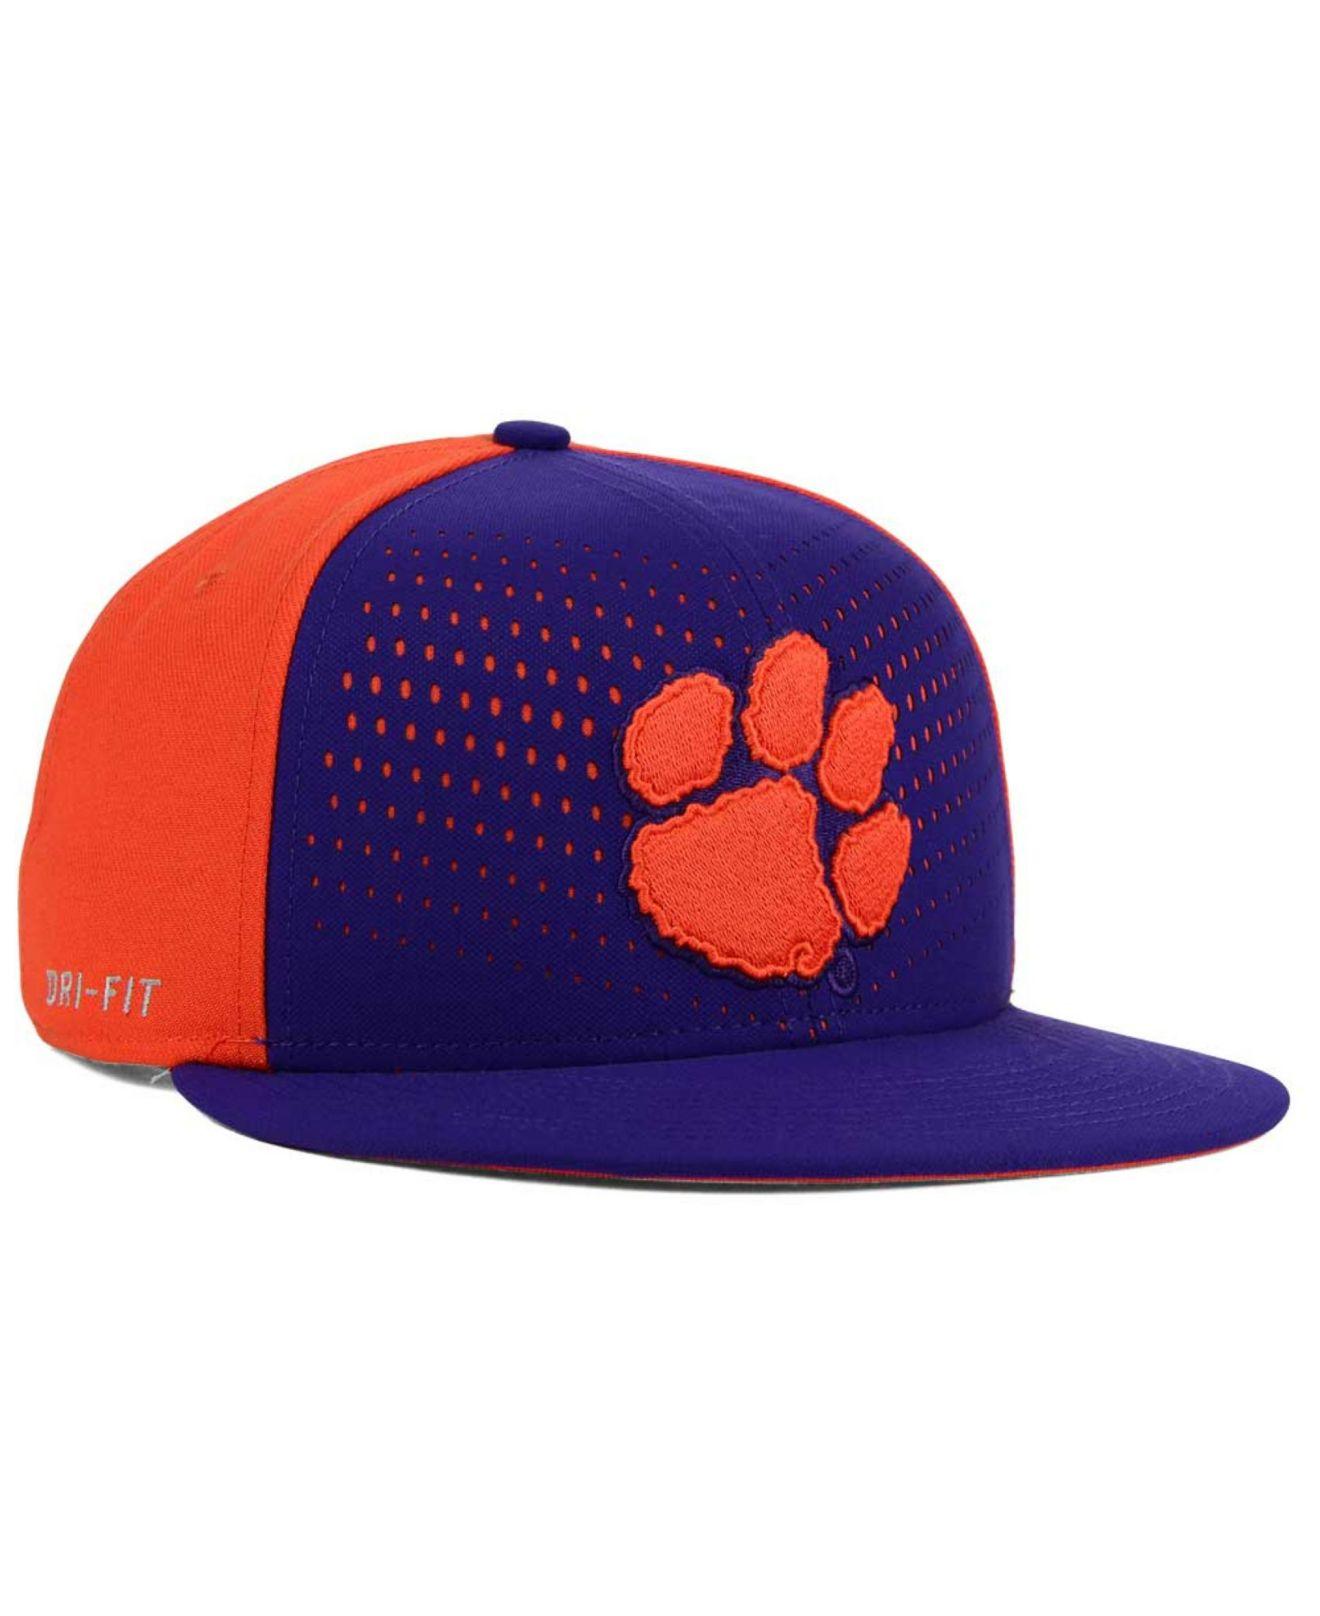 1f38b45cf93 ... usa lyst nike clemson tigers true seasonal snapback cap in purple for  men 70fe8 84c15